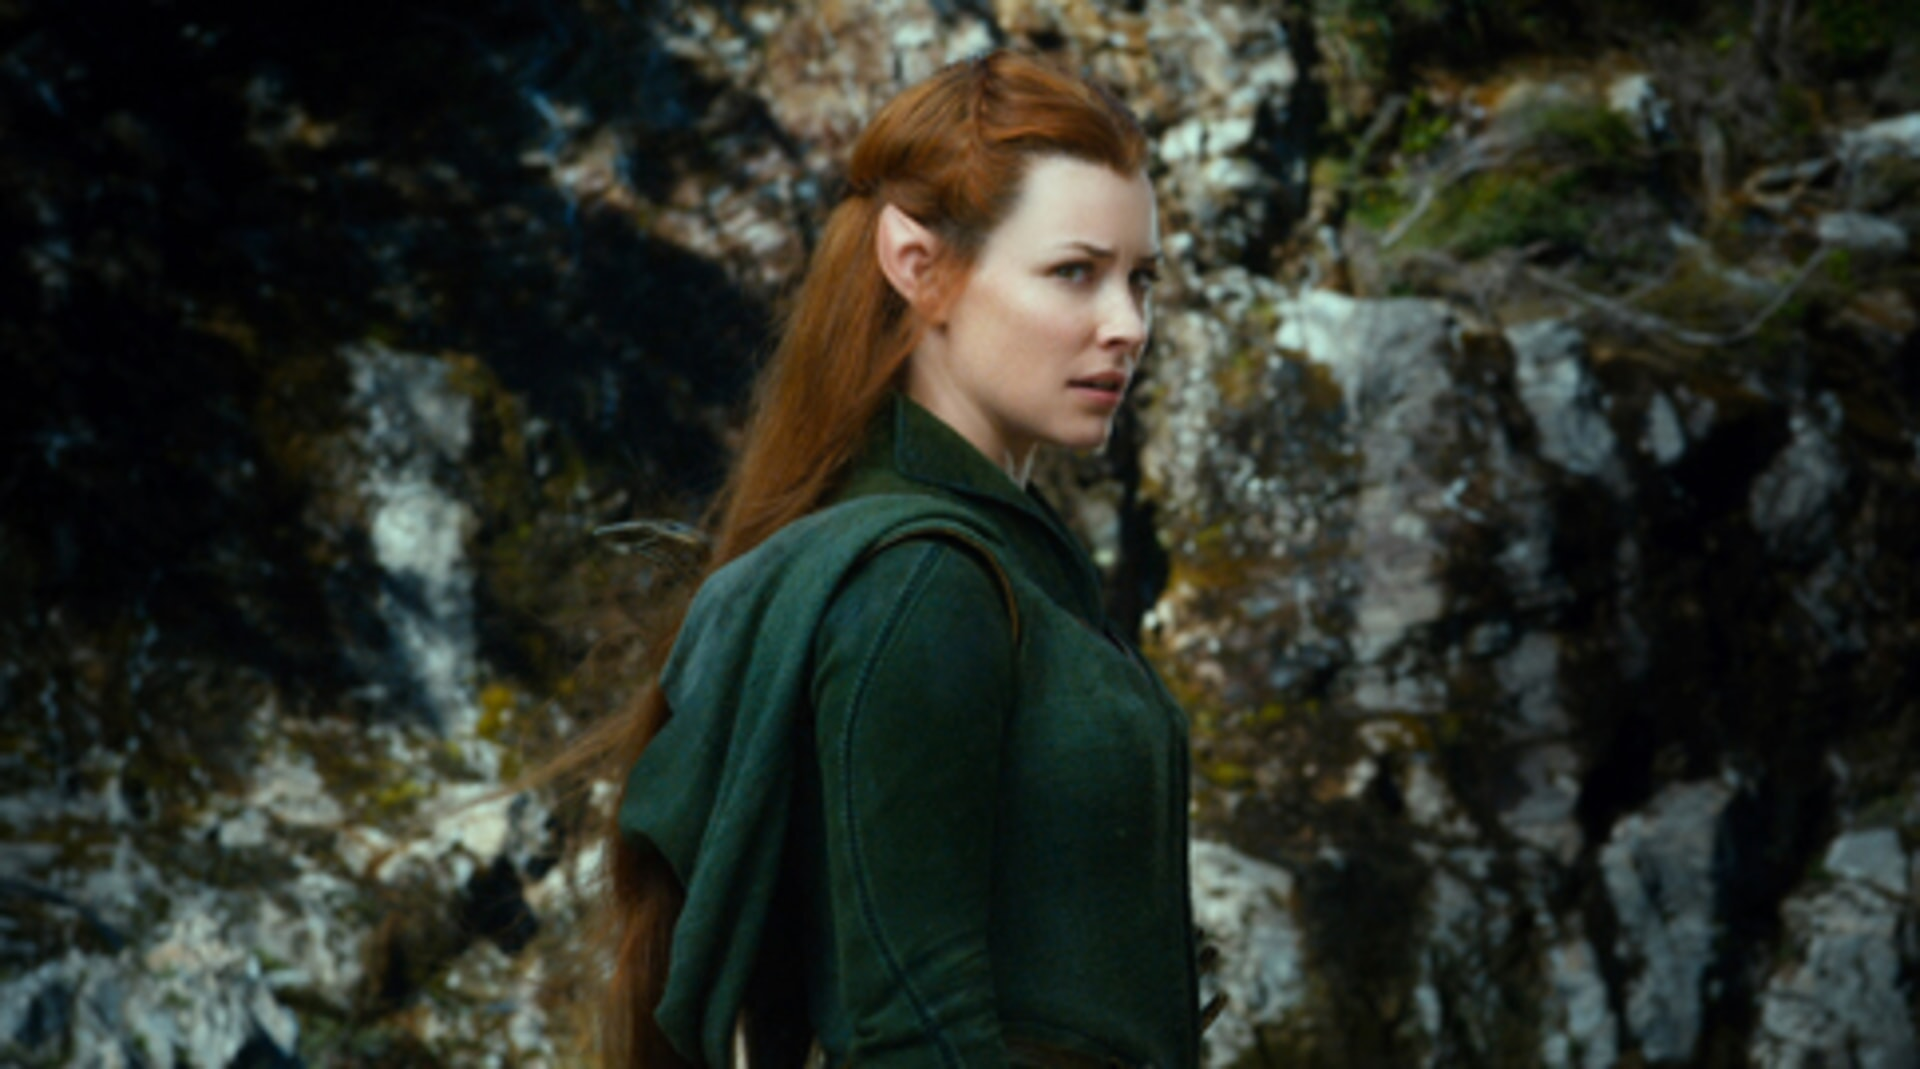 The Hobbit: The Desolation of Smaug - Image 32